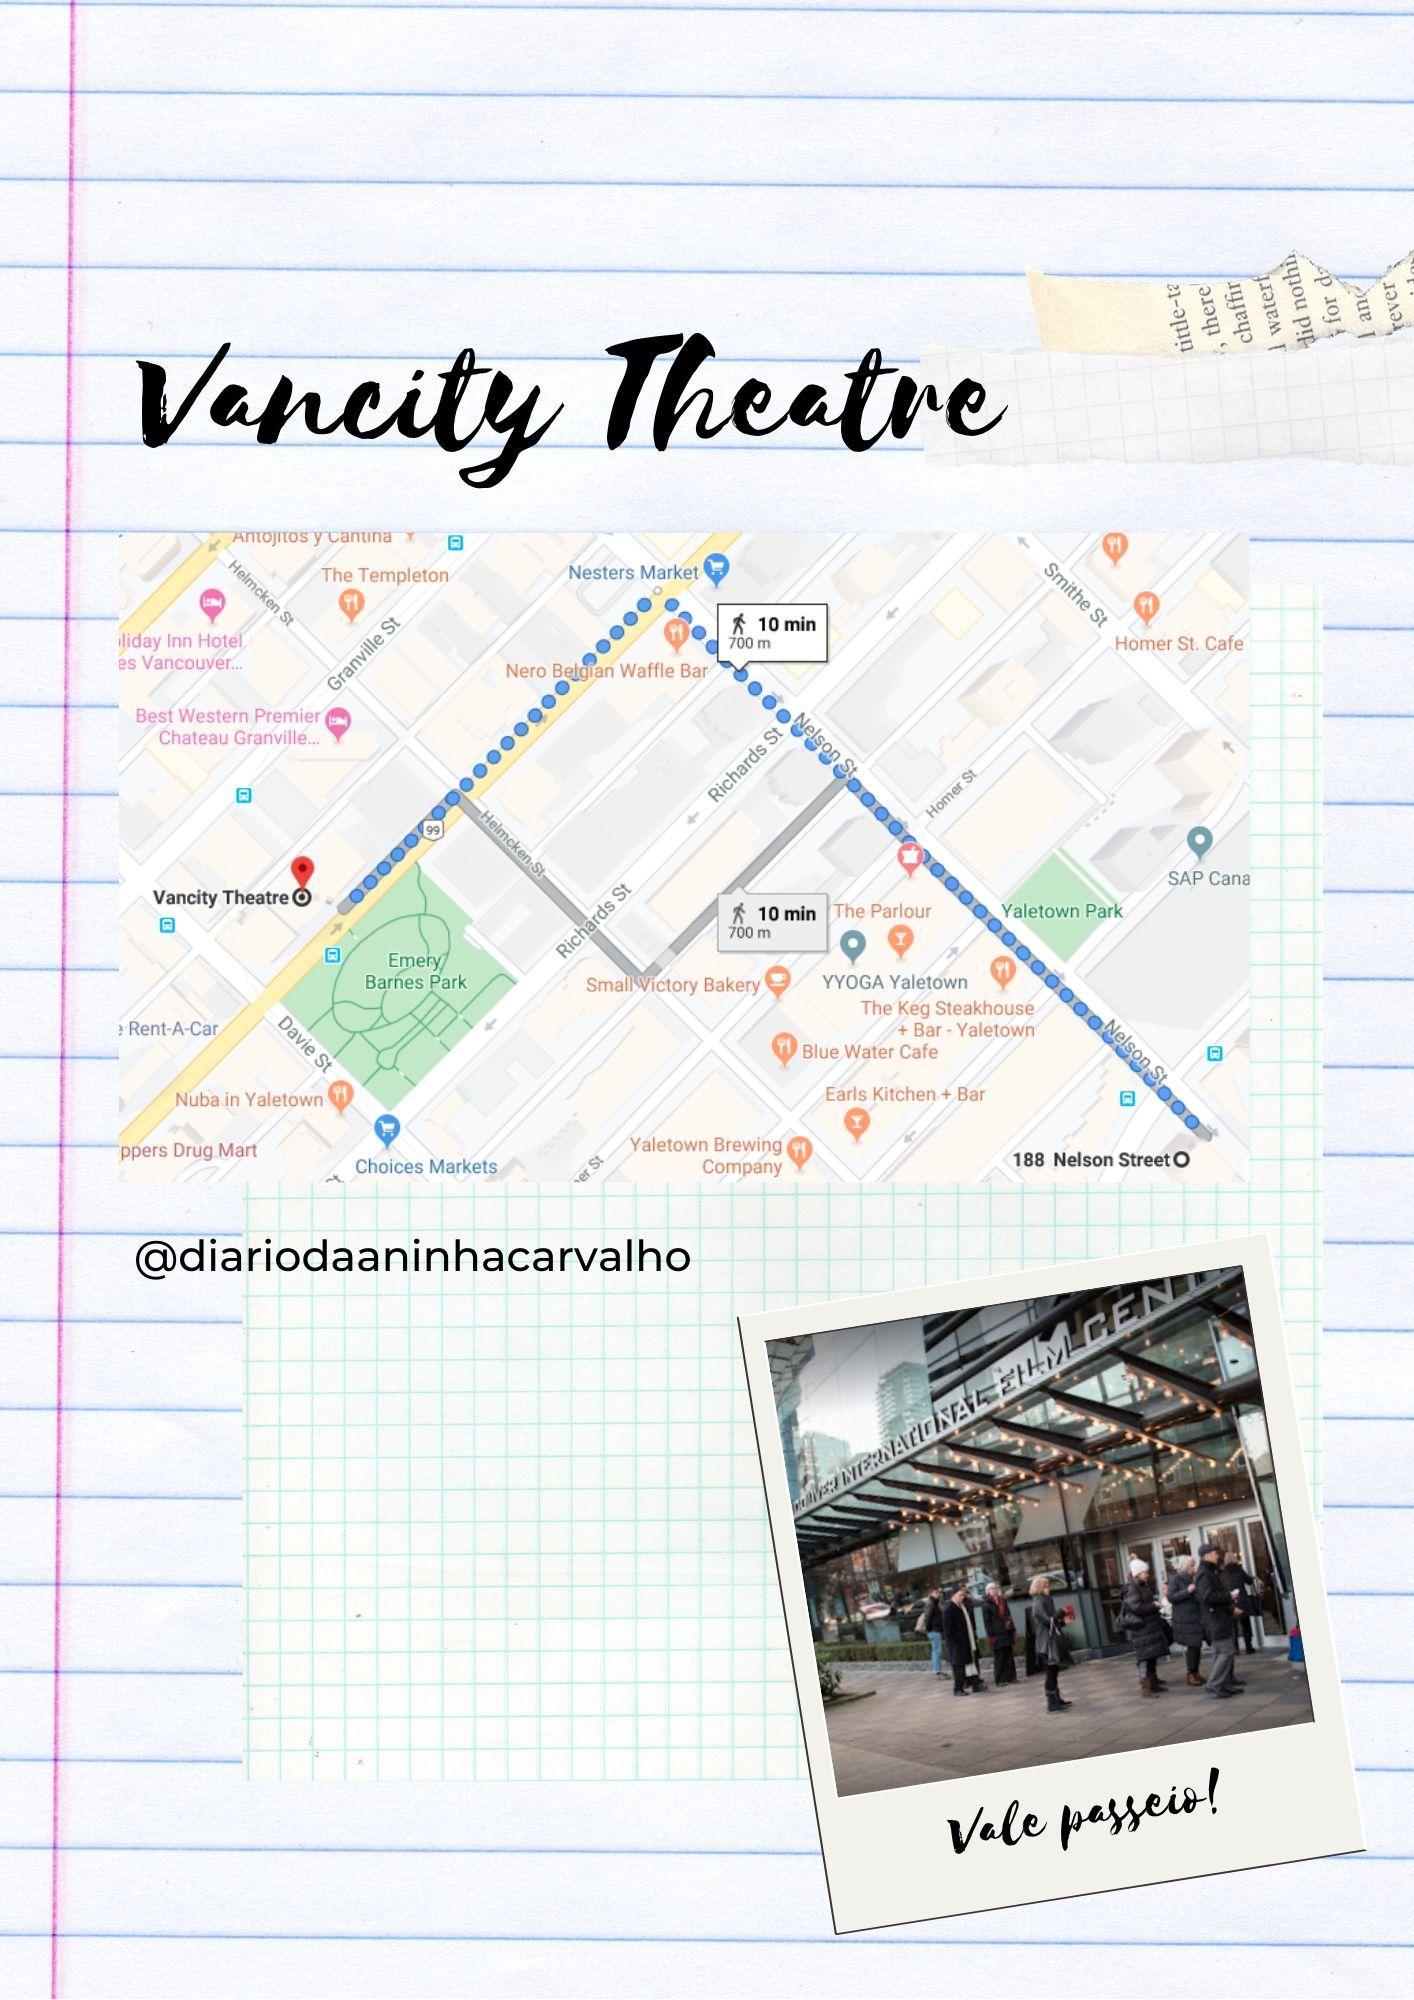 vancity theatre passeios rapidos depois das aulas do intercambio